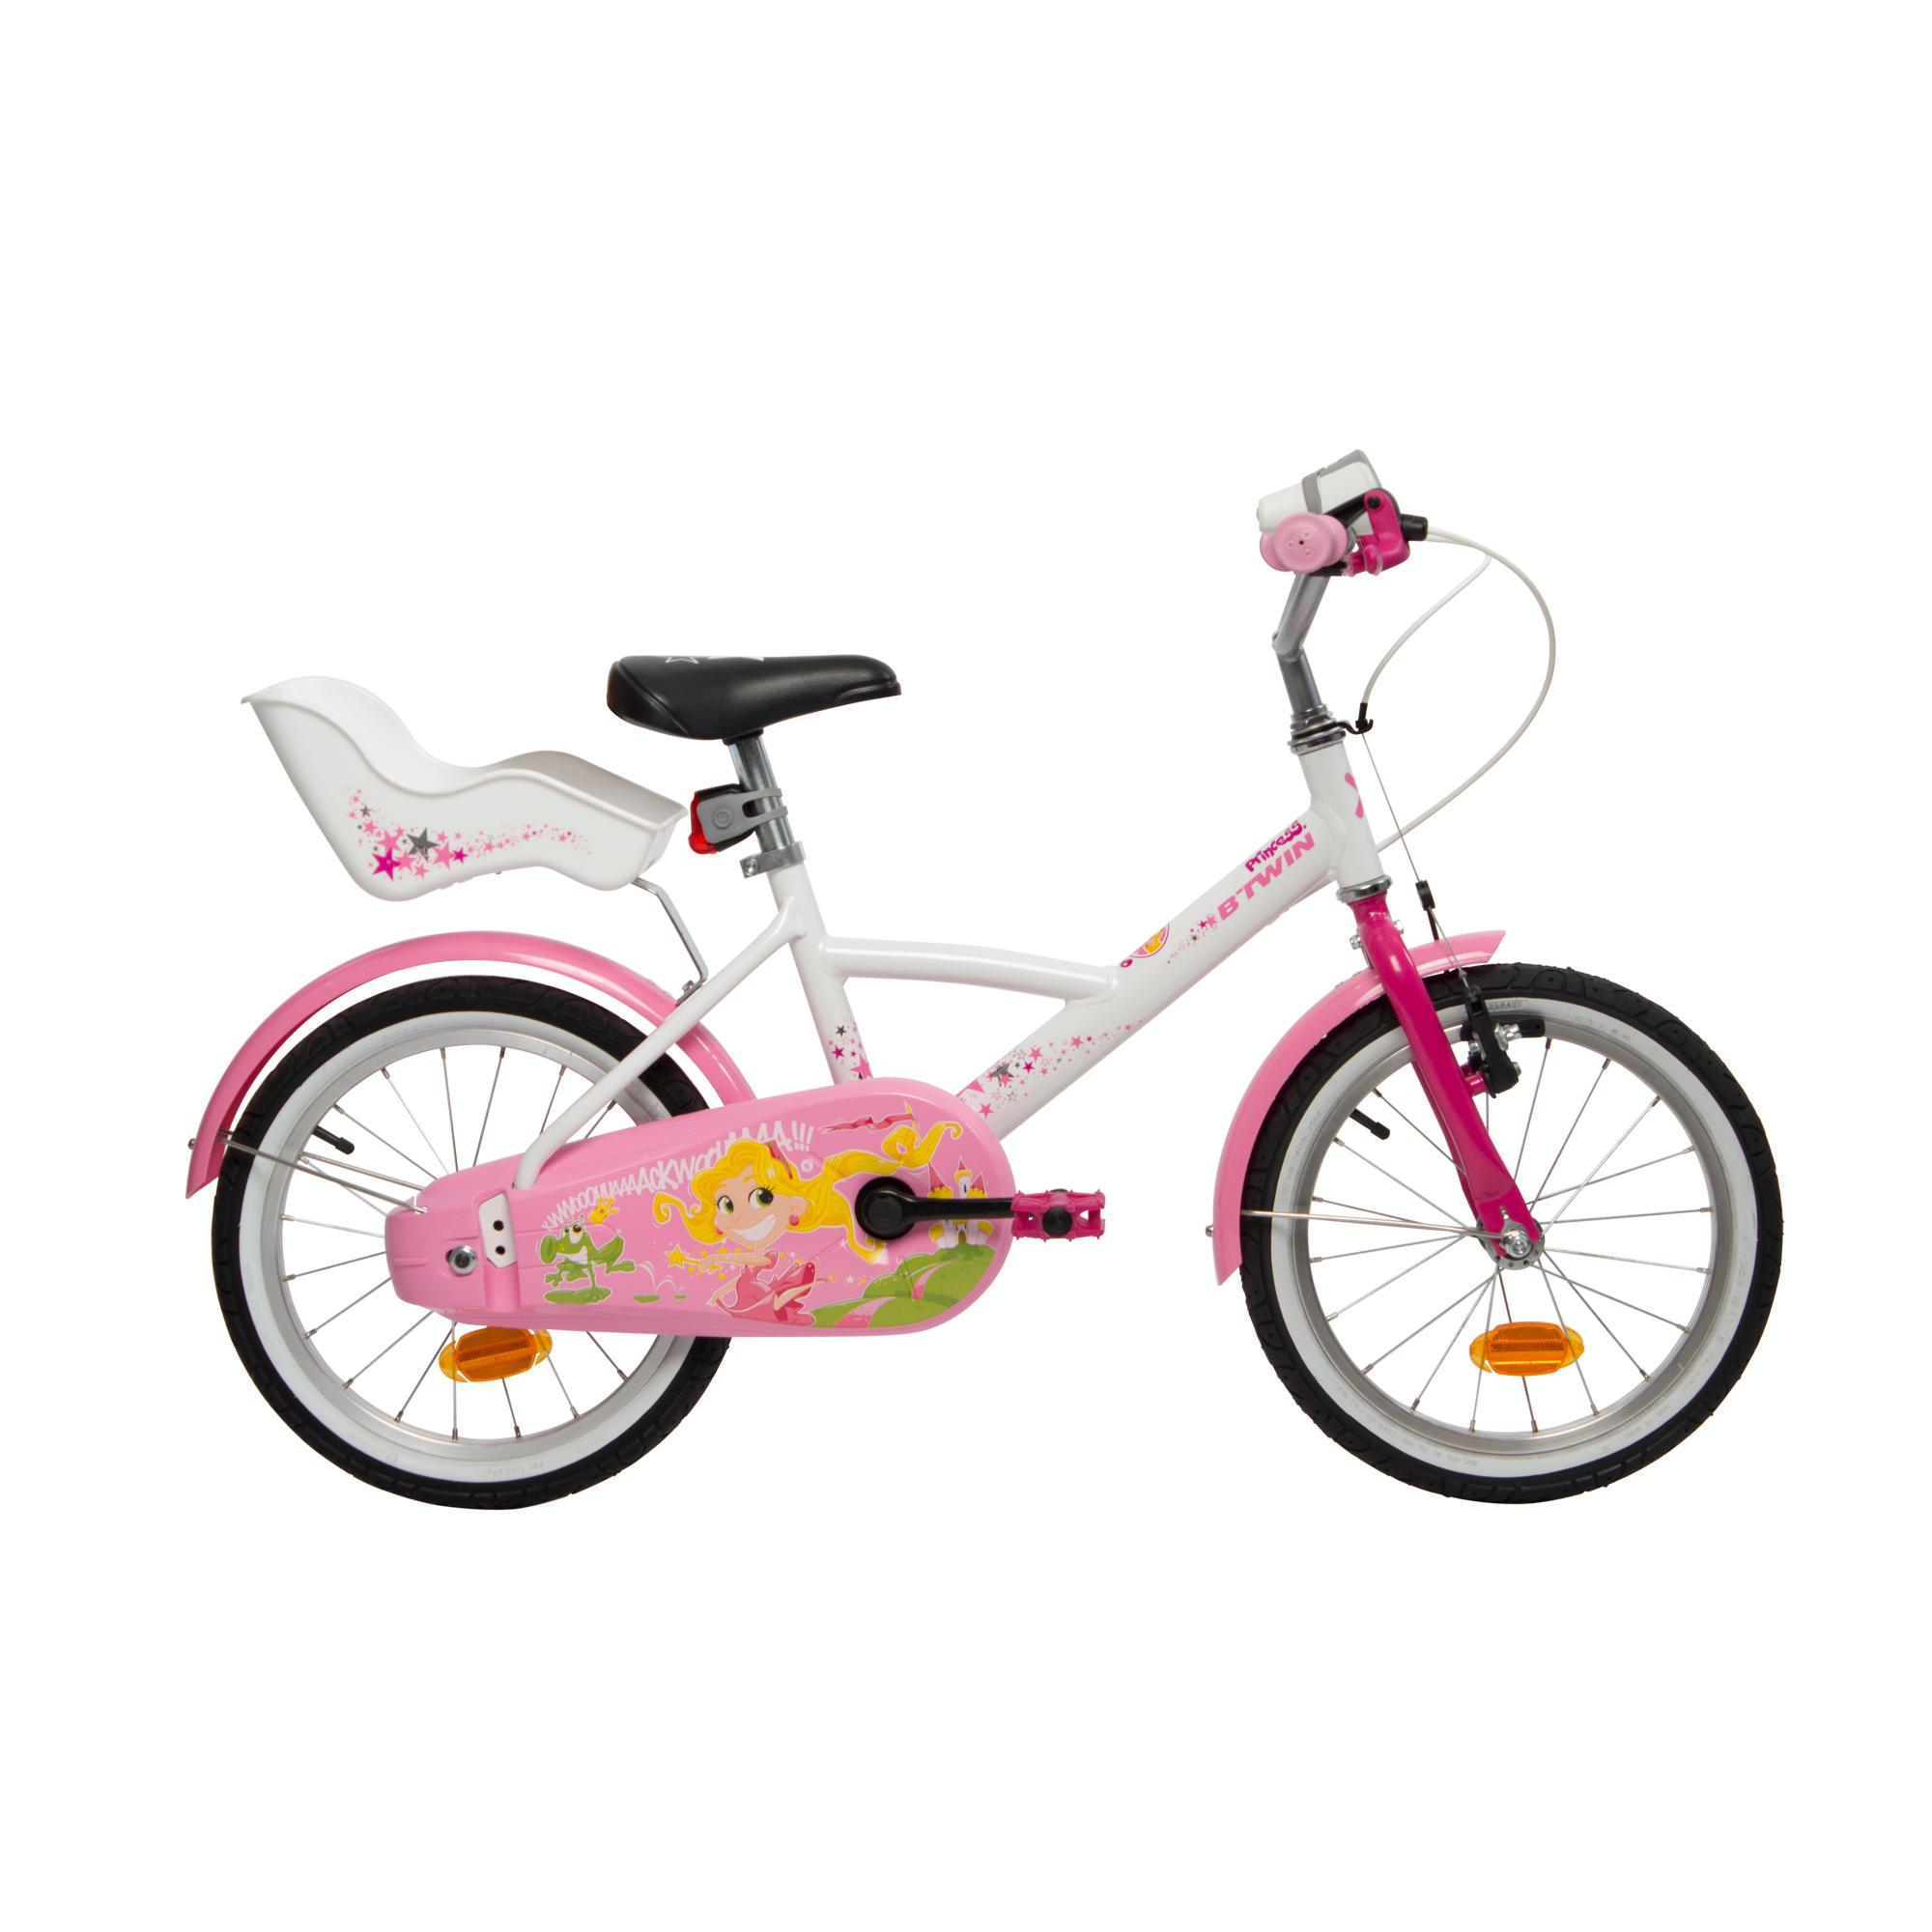 "B'twin Kinderfiets 16 inch Liloo Princess wit/roze - 16"""